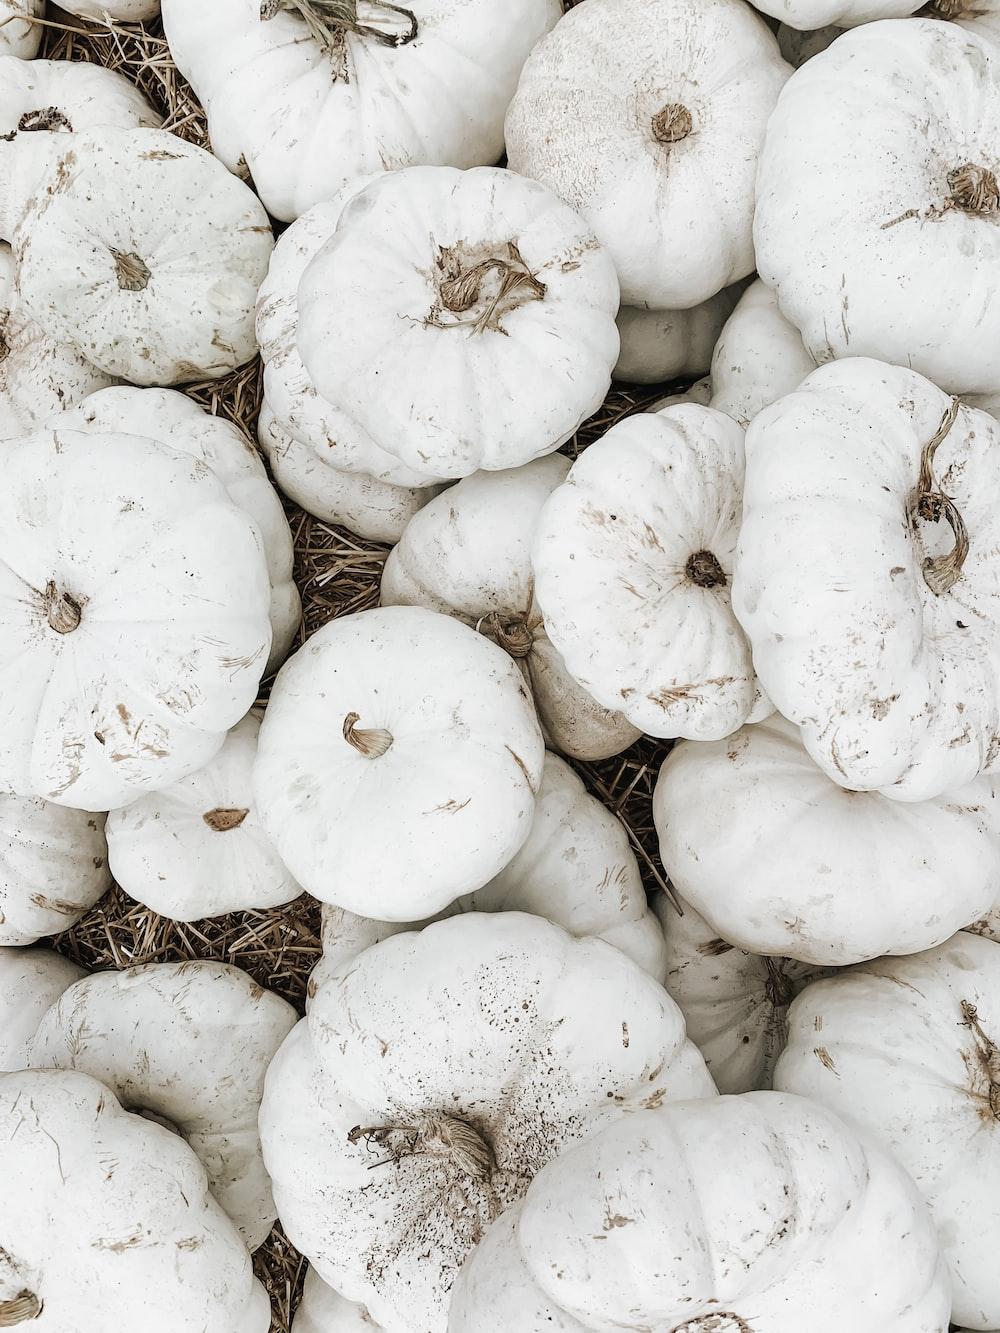 pile of white squash vegetables